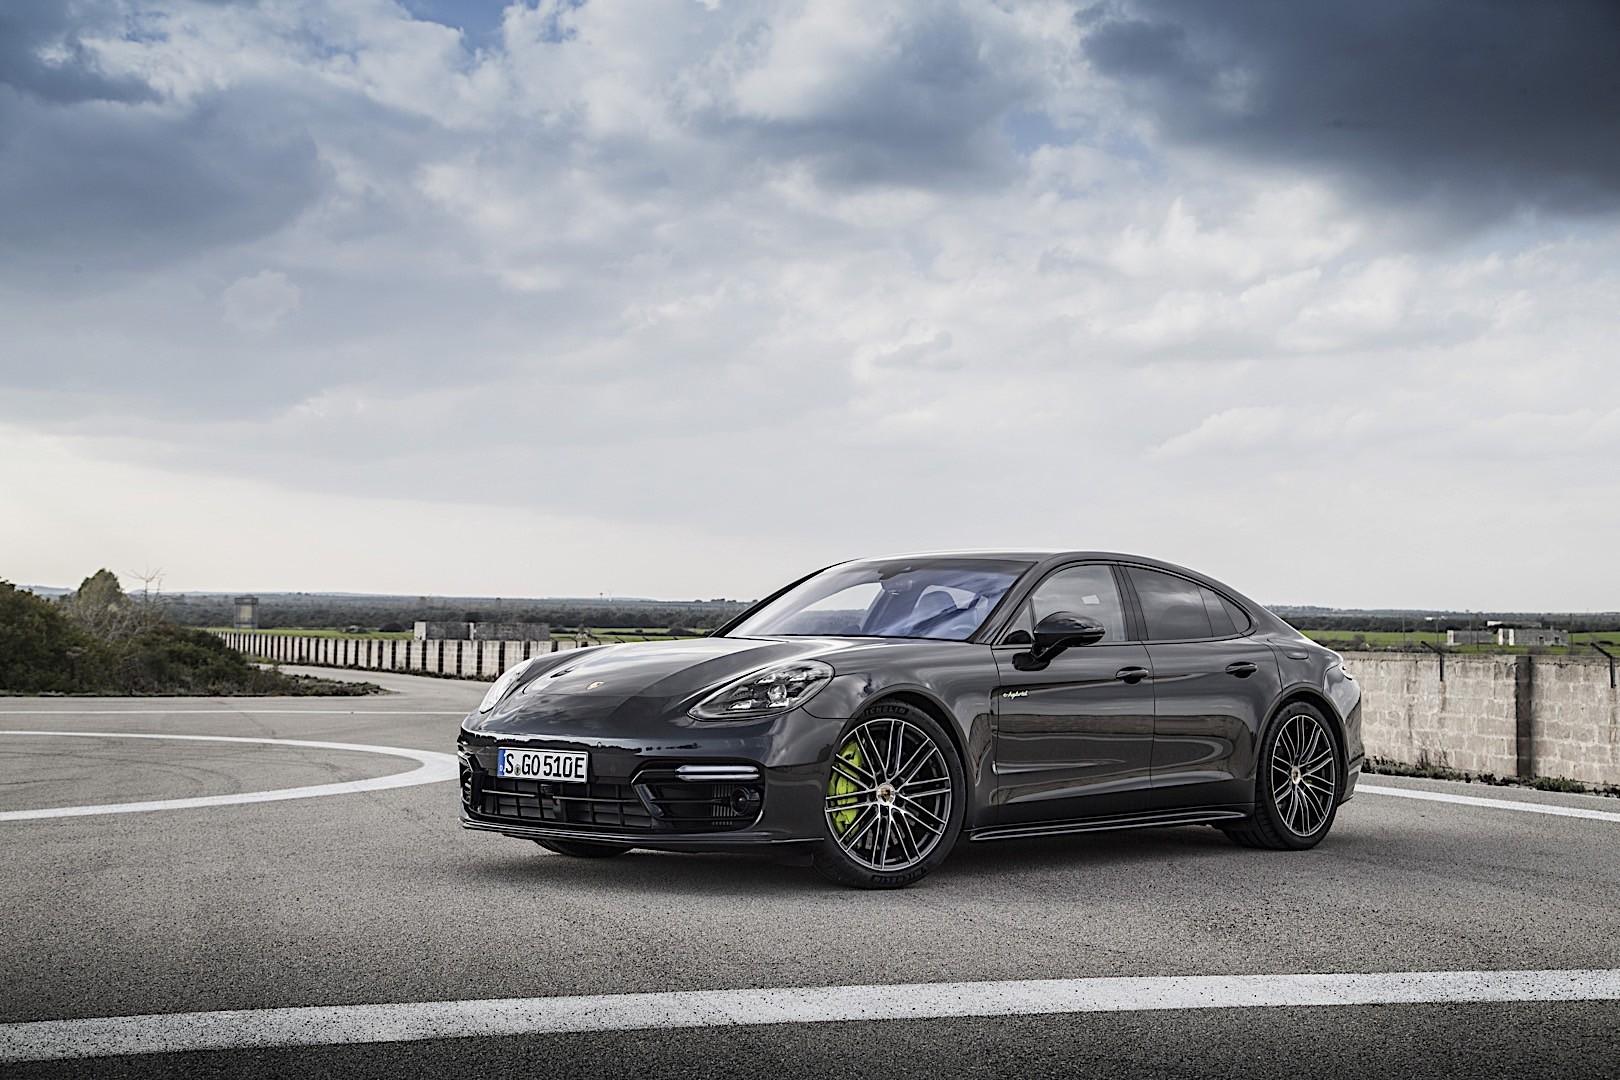 Porsche Panamera Turbo S E-hybrid Specs  U0026 Photos - 2017  2018  2019  2020